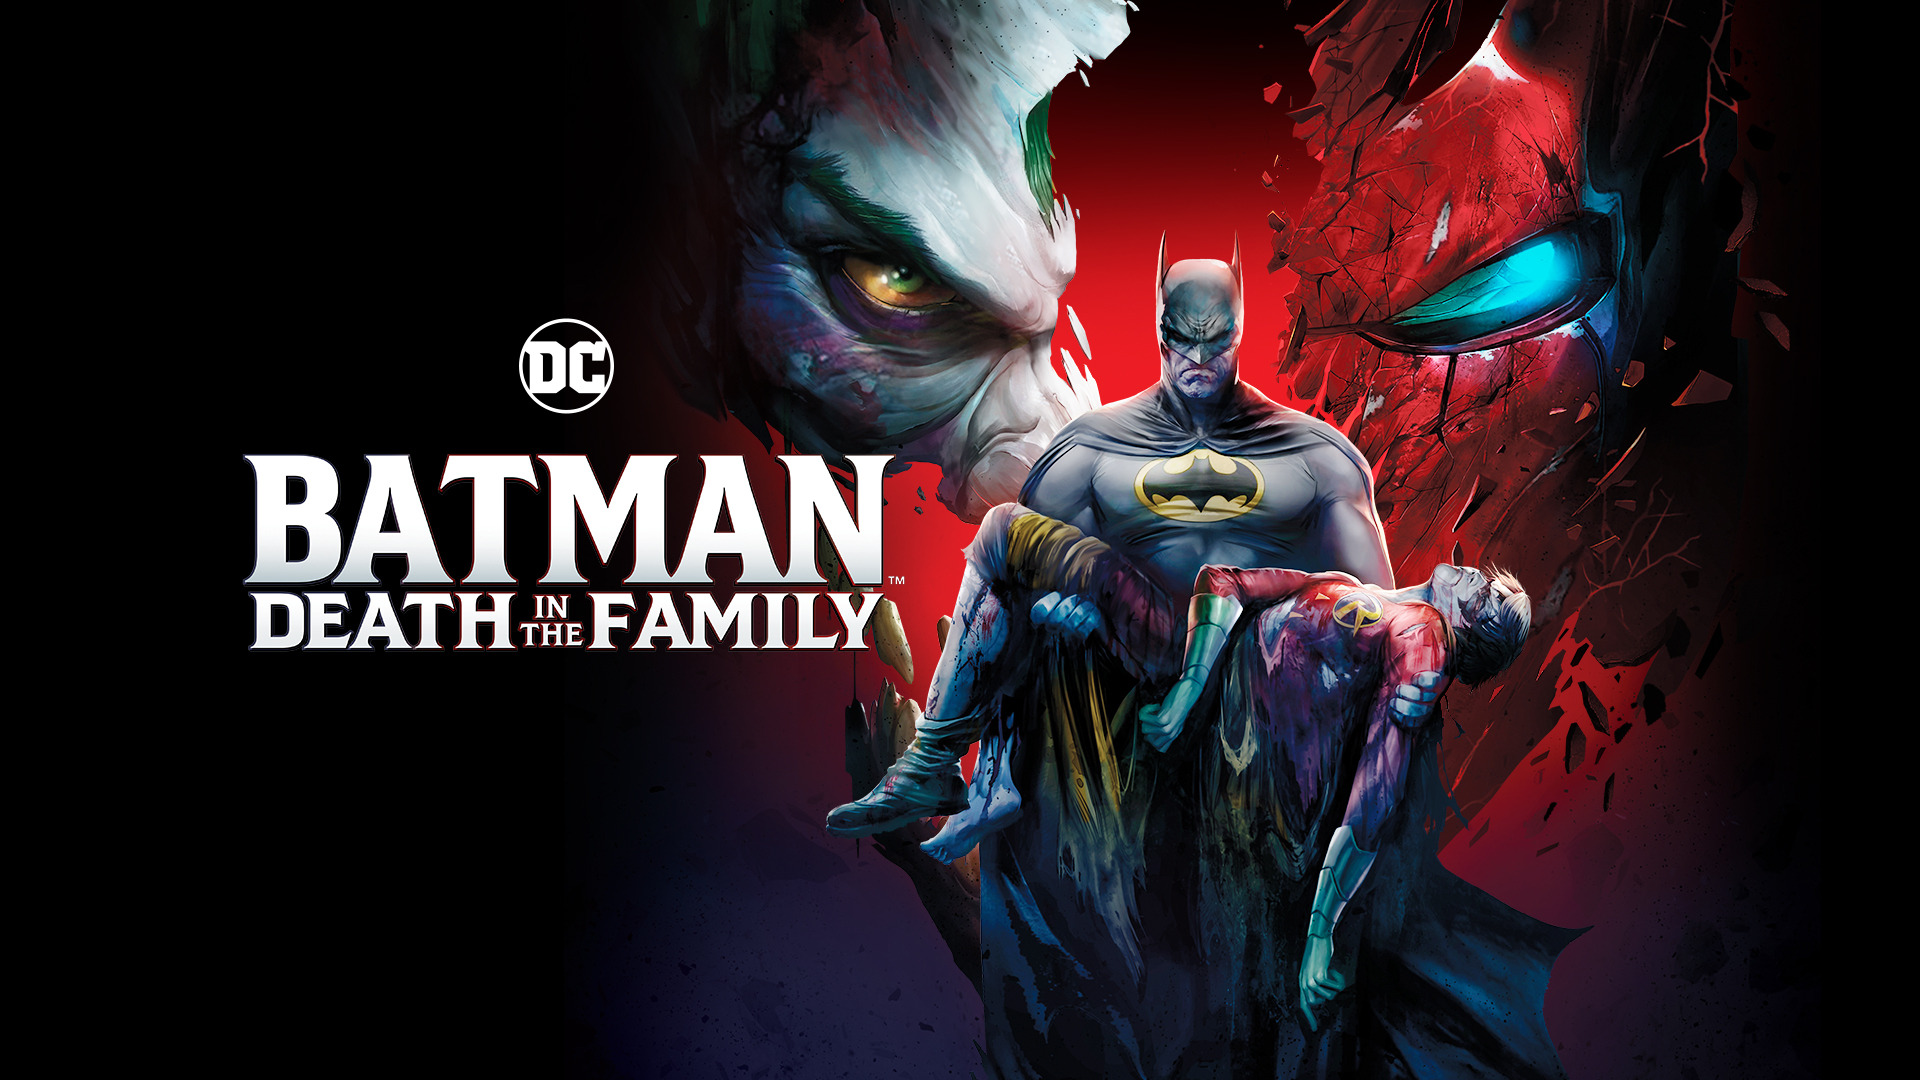 Batman: Death in the Family (Non-Interactive) (DC Showcase Shorts Collection)